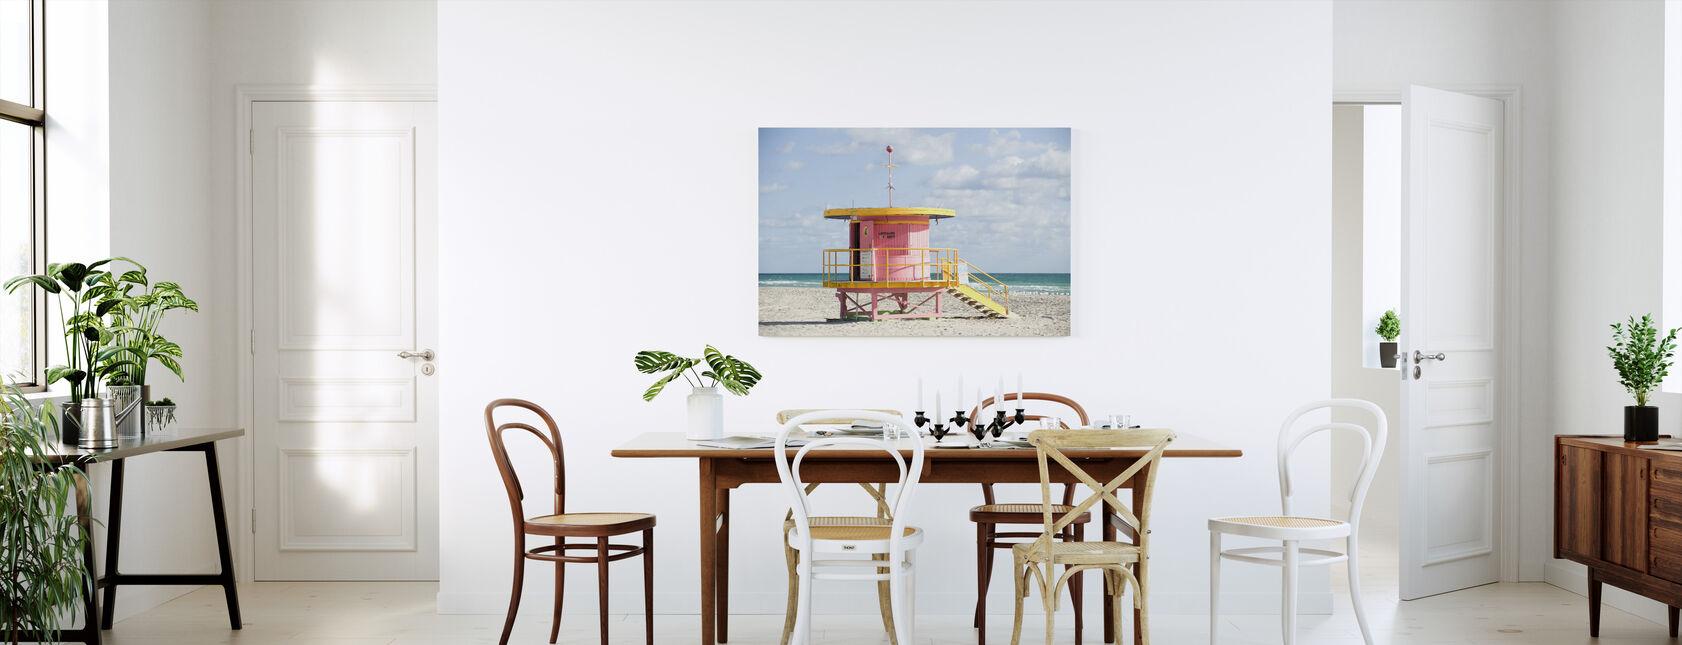 Lifeguard Tower in Miami, USA - Canvas print - Kitchen